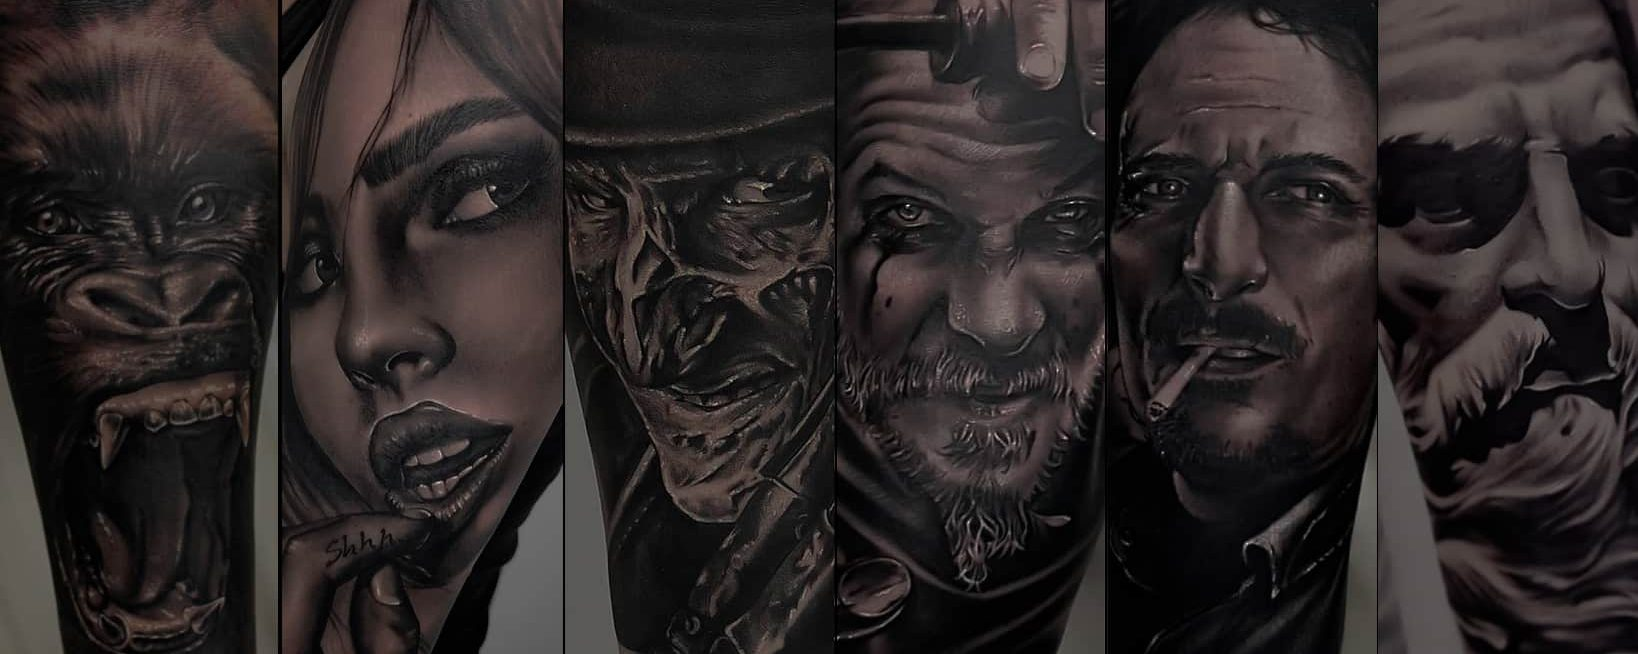 Steel Of Doom Tattoo Barcelona & Piercing